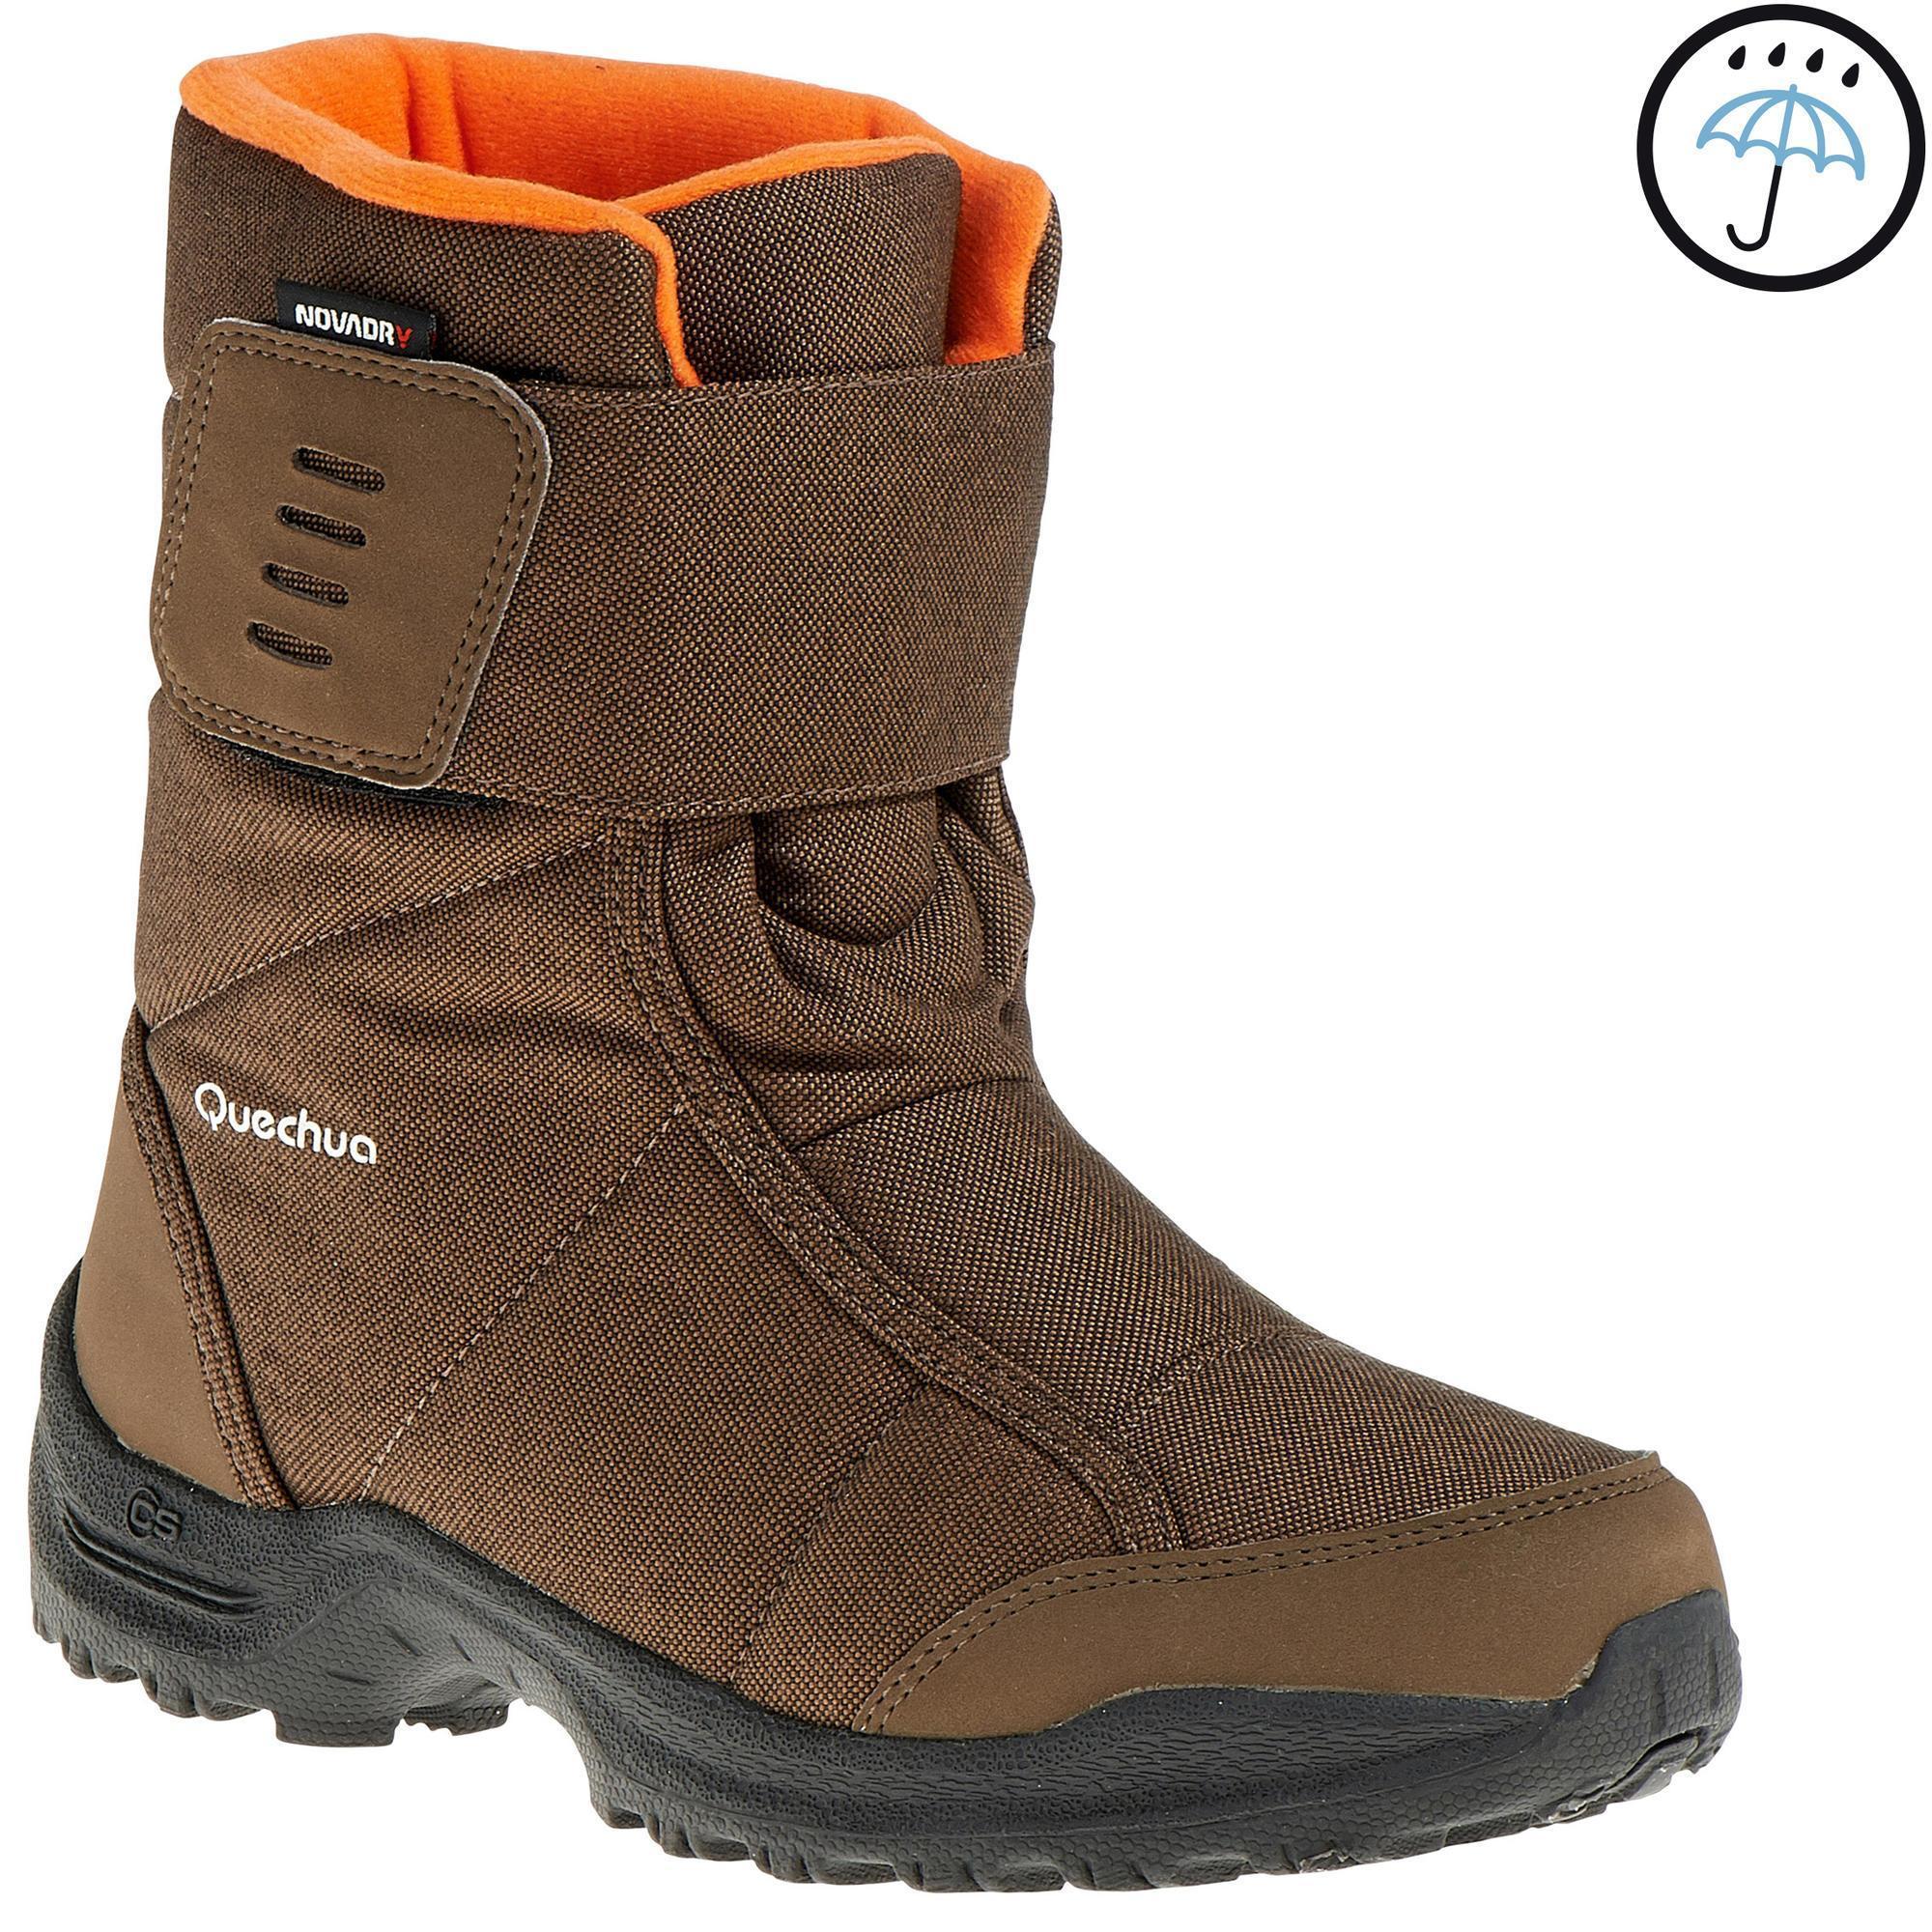 Types Of Mattresses >> Quechua Arpenaz 100 Warm Novadry Children's hiking boots ...